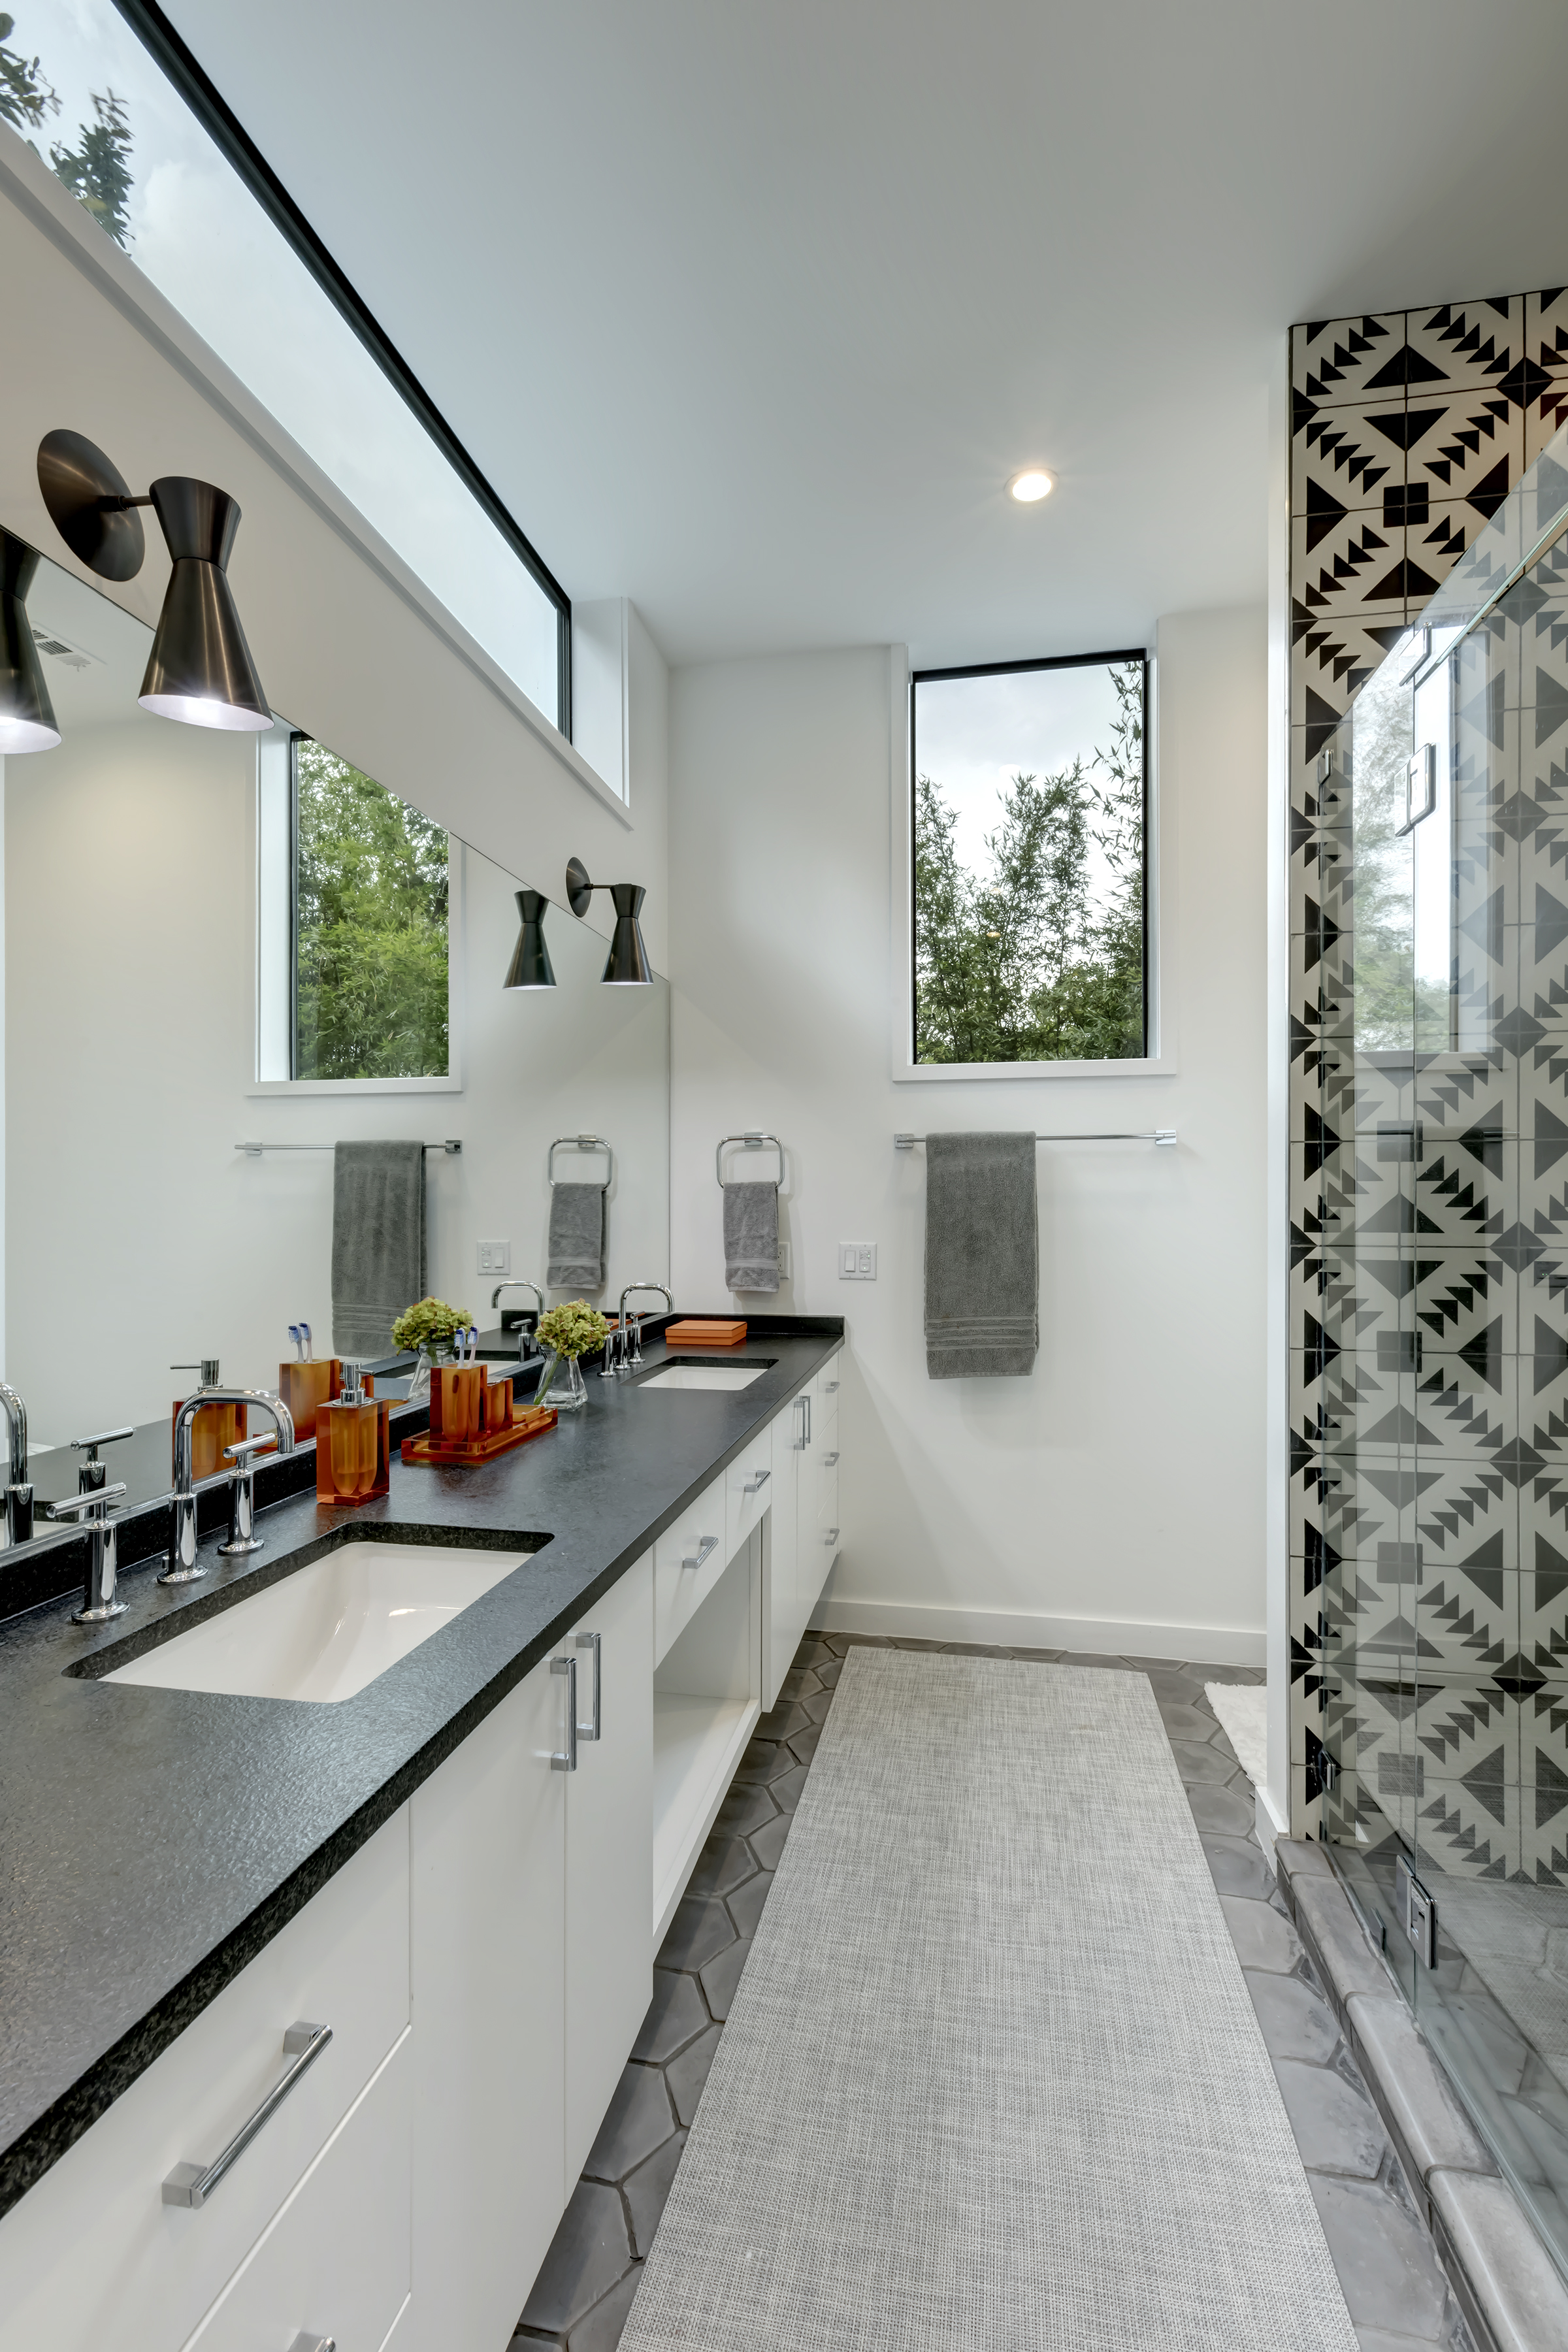 Matt Fajkus MF Architecture Add Subtract House_Photo 10 by Charles Davis Smith.jpg